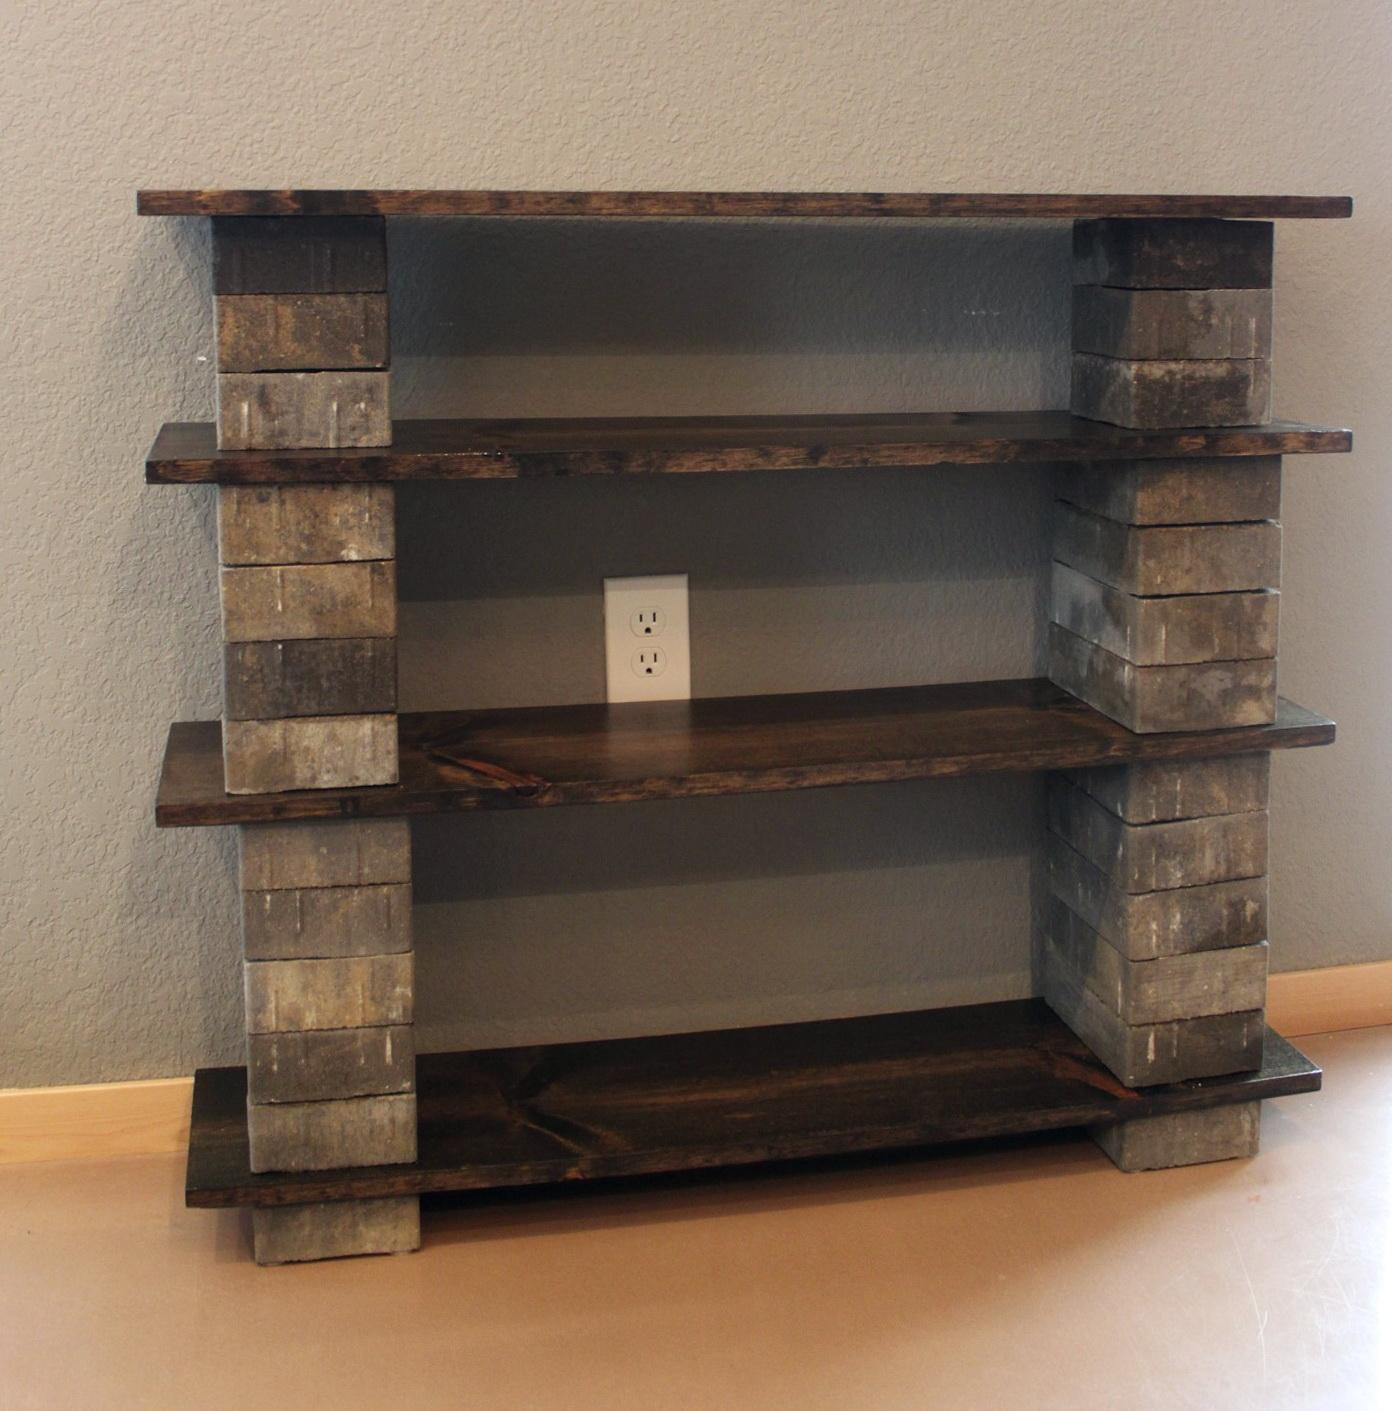 Kids bookshelf diy home design ideas for Diy kids bookshelf ideas